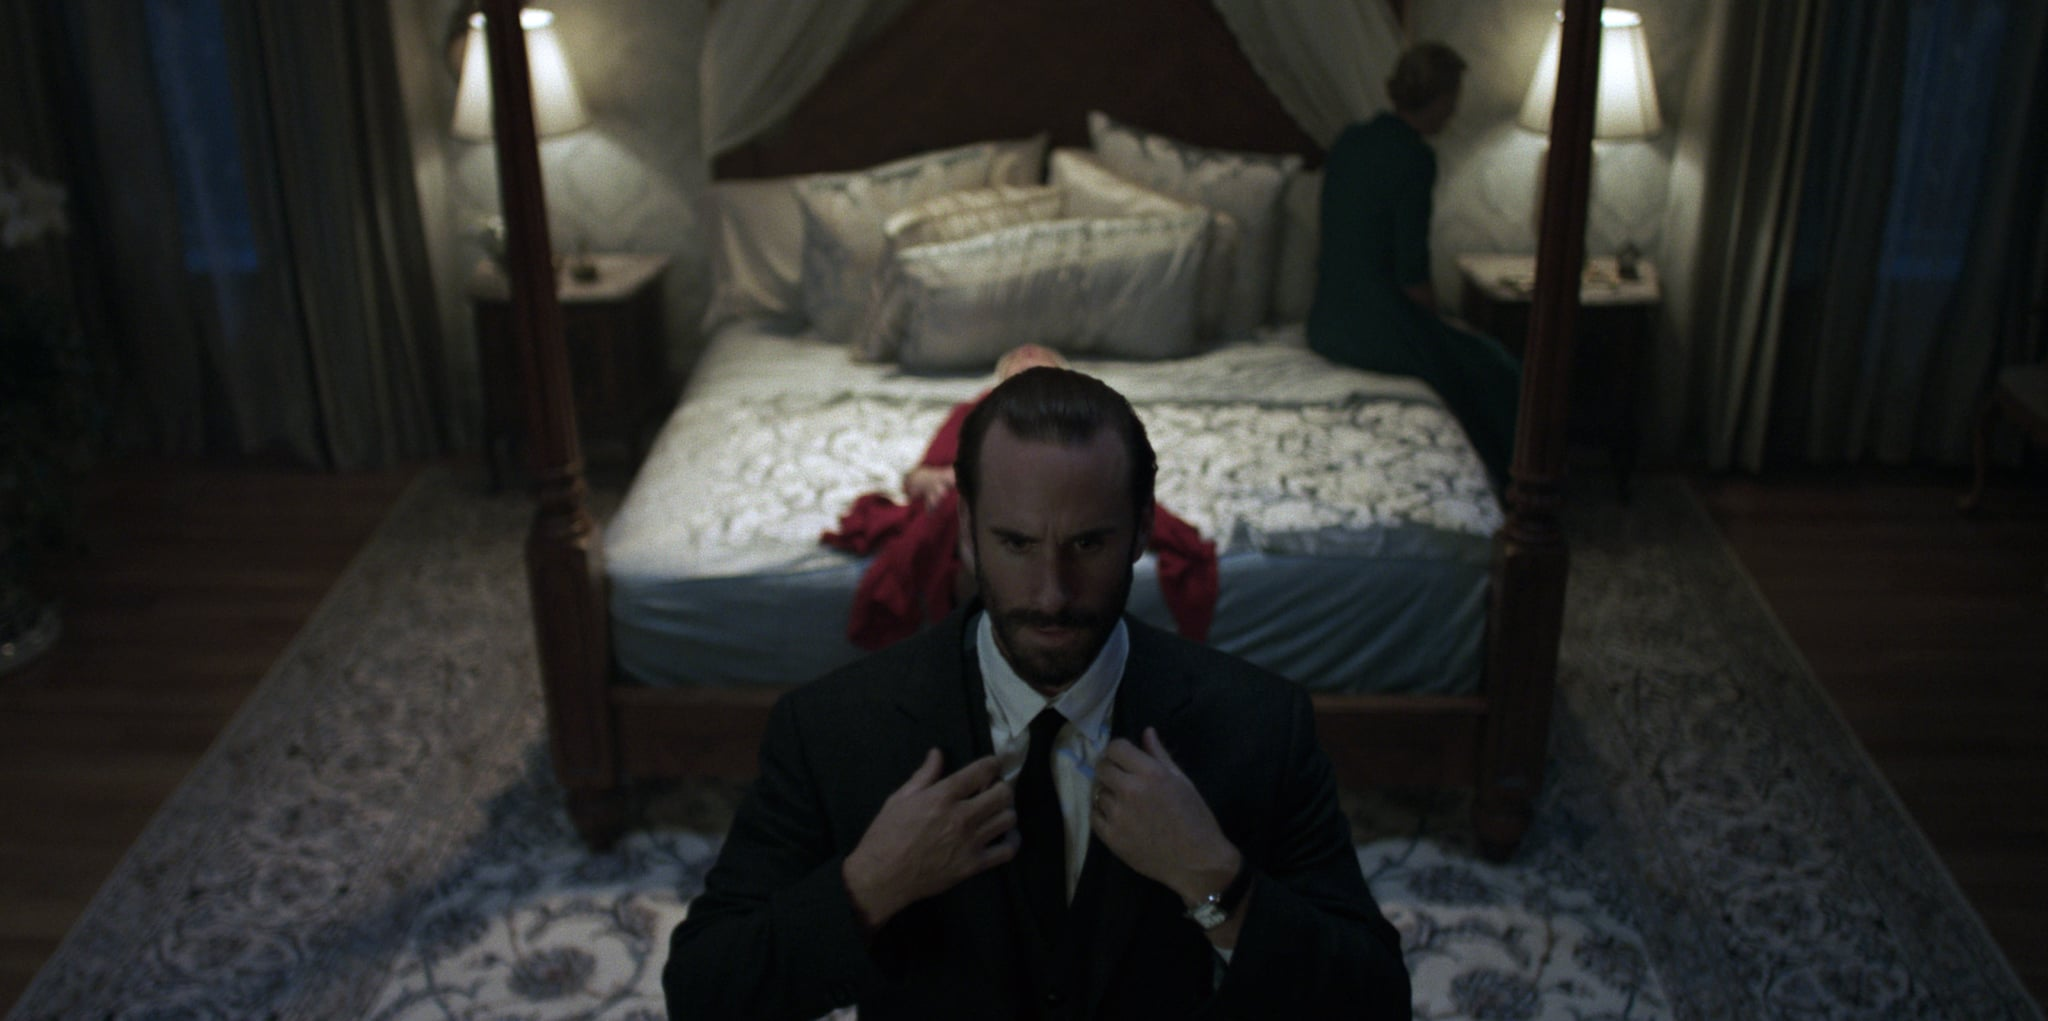 THE HANDMAID'S TALE, Joseph Fiennes, (Season 1, premieres April 26, 2017). photo: Take Five / Hulu / Courtesy: Everett Collection